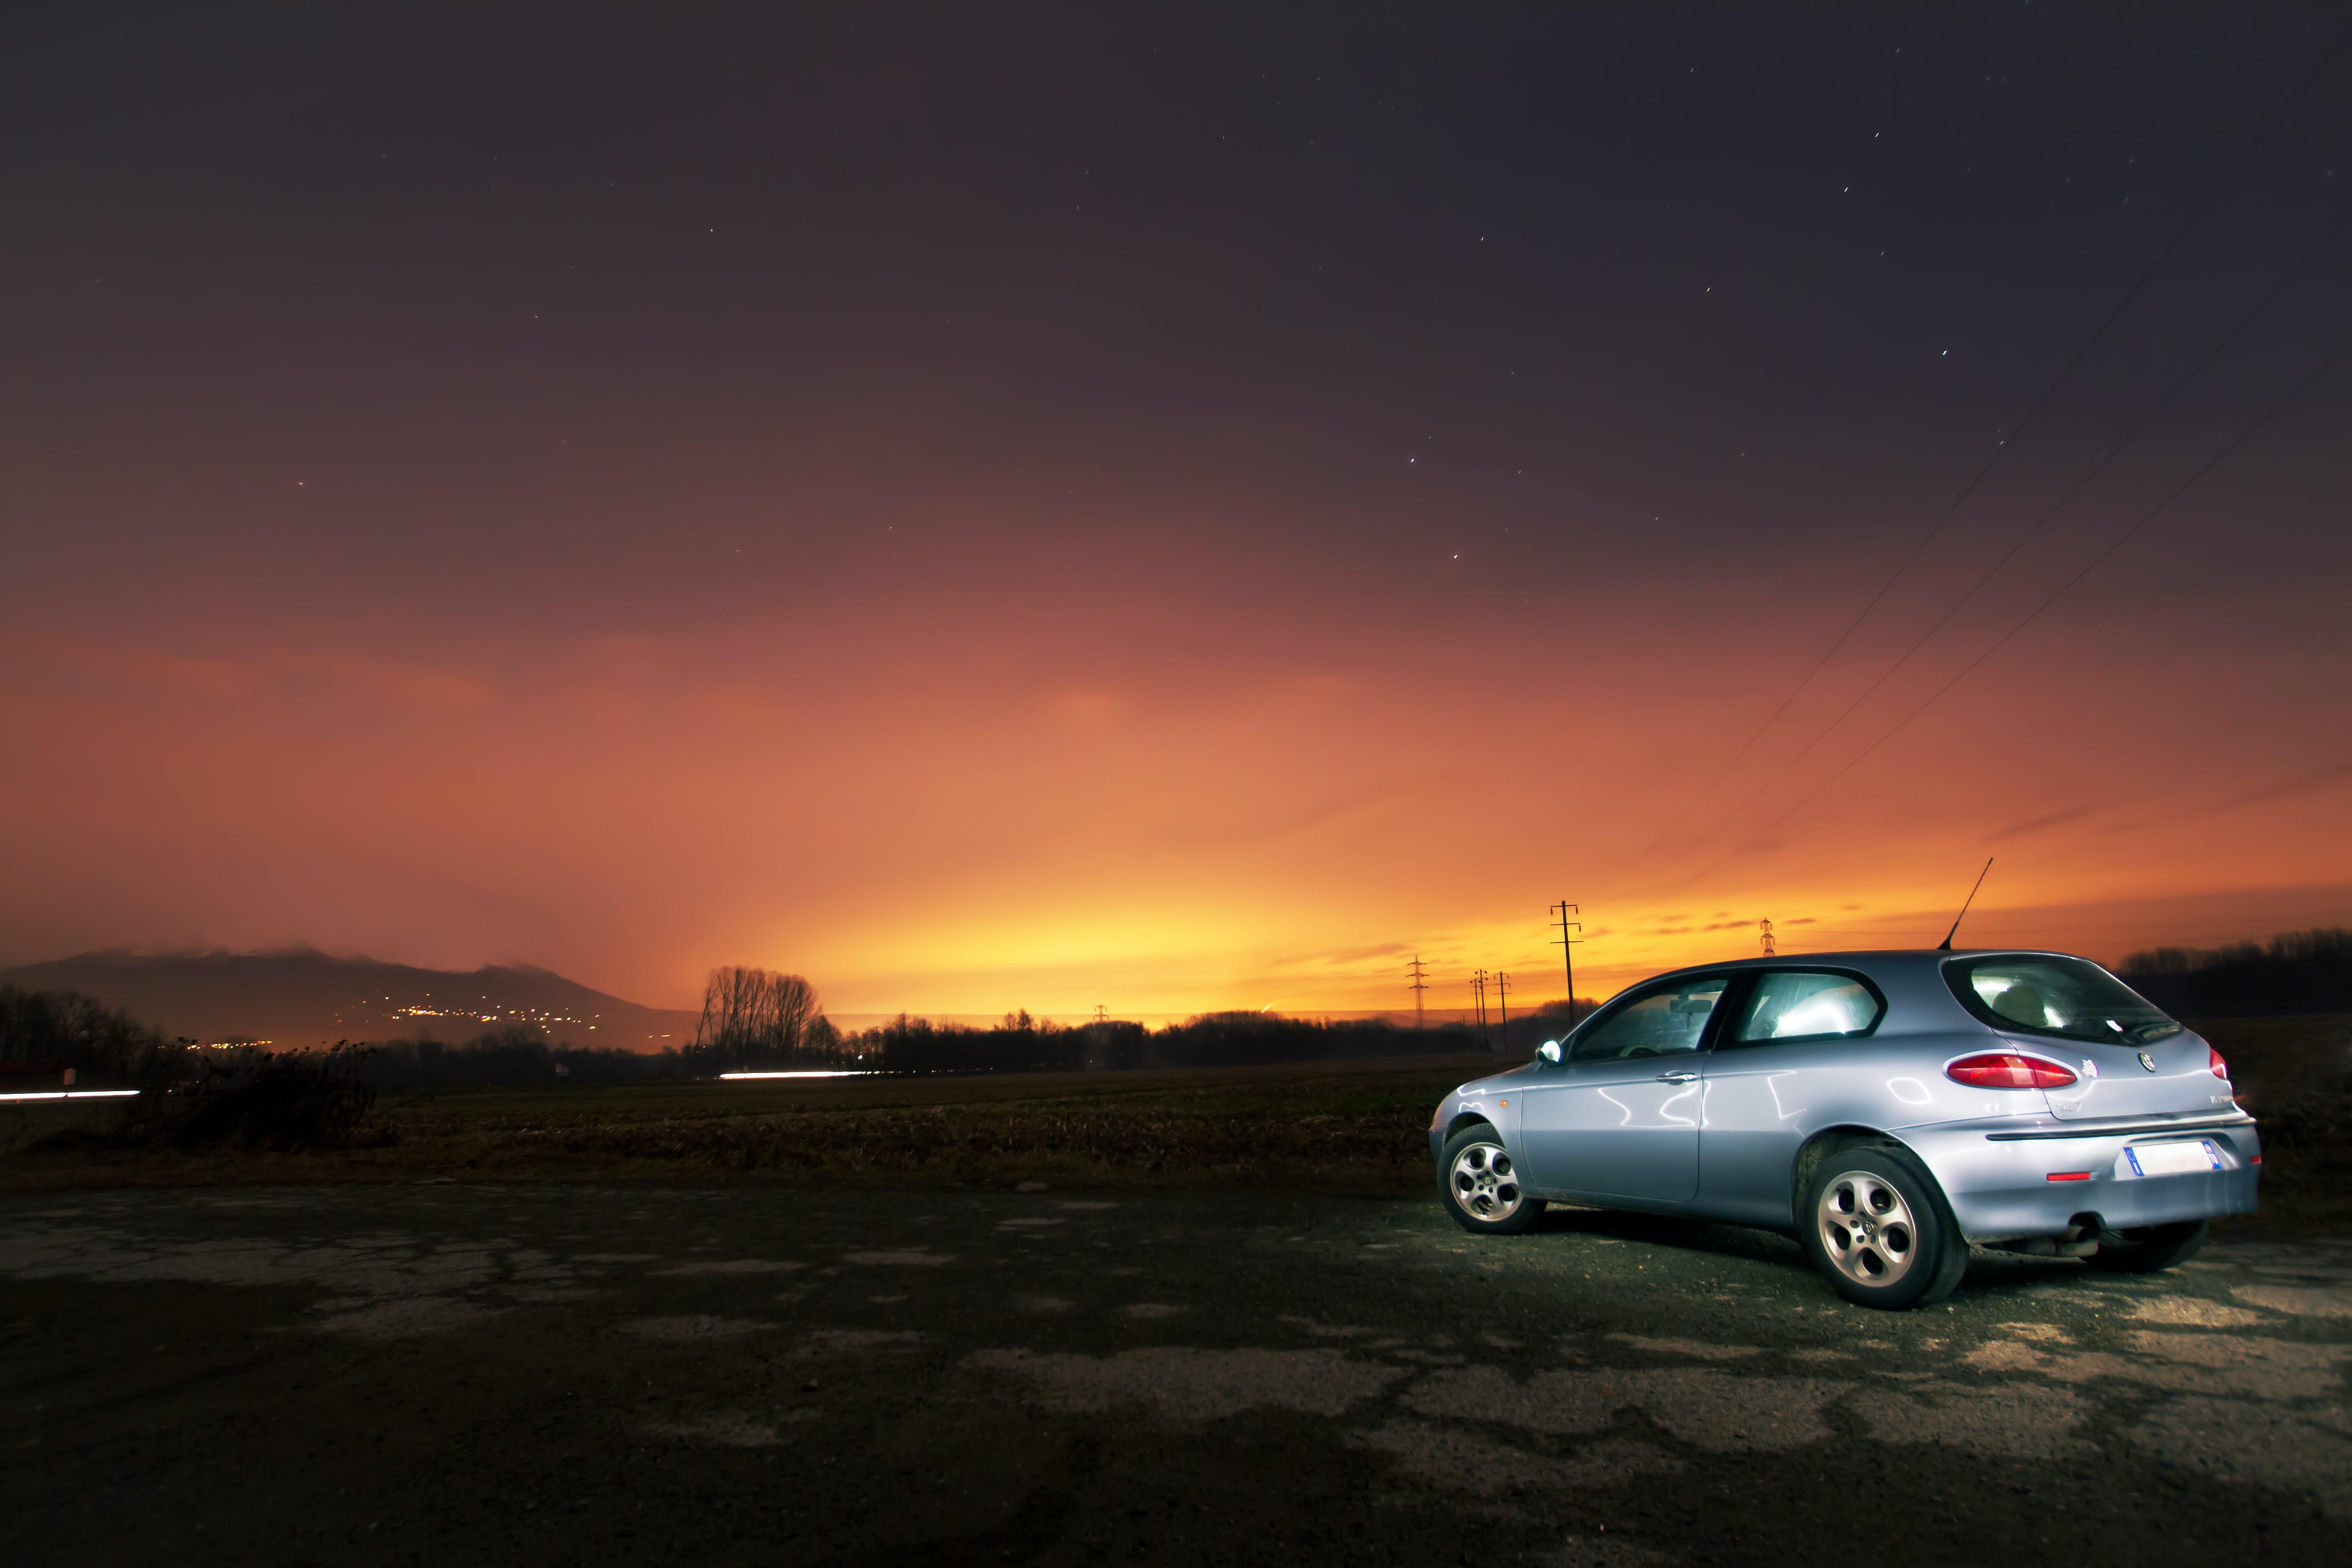 Free stock photo of dawn, sky, sunset, night